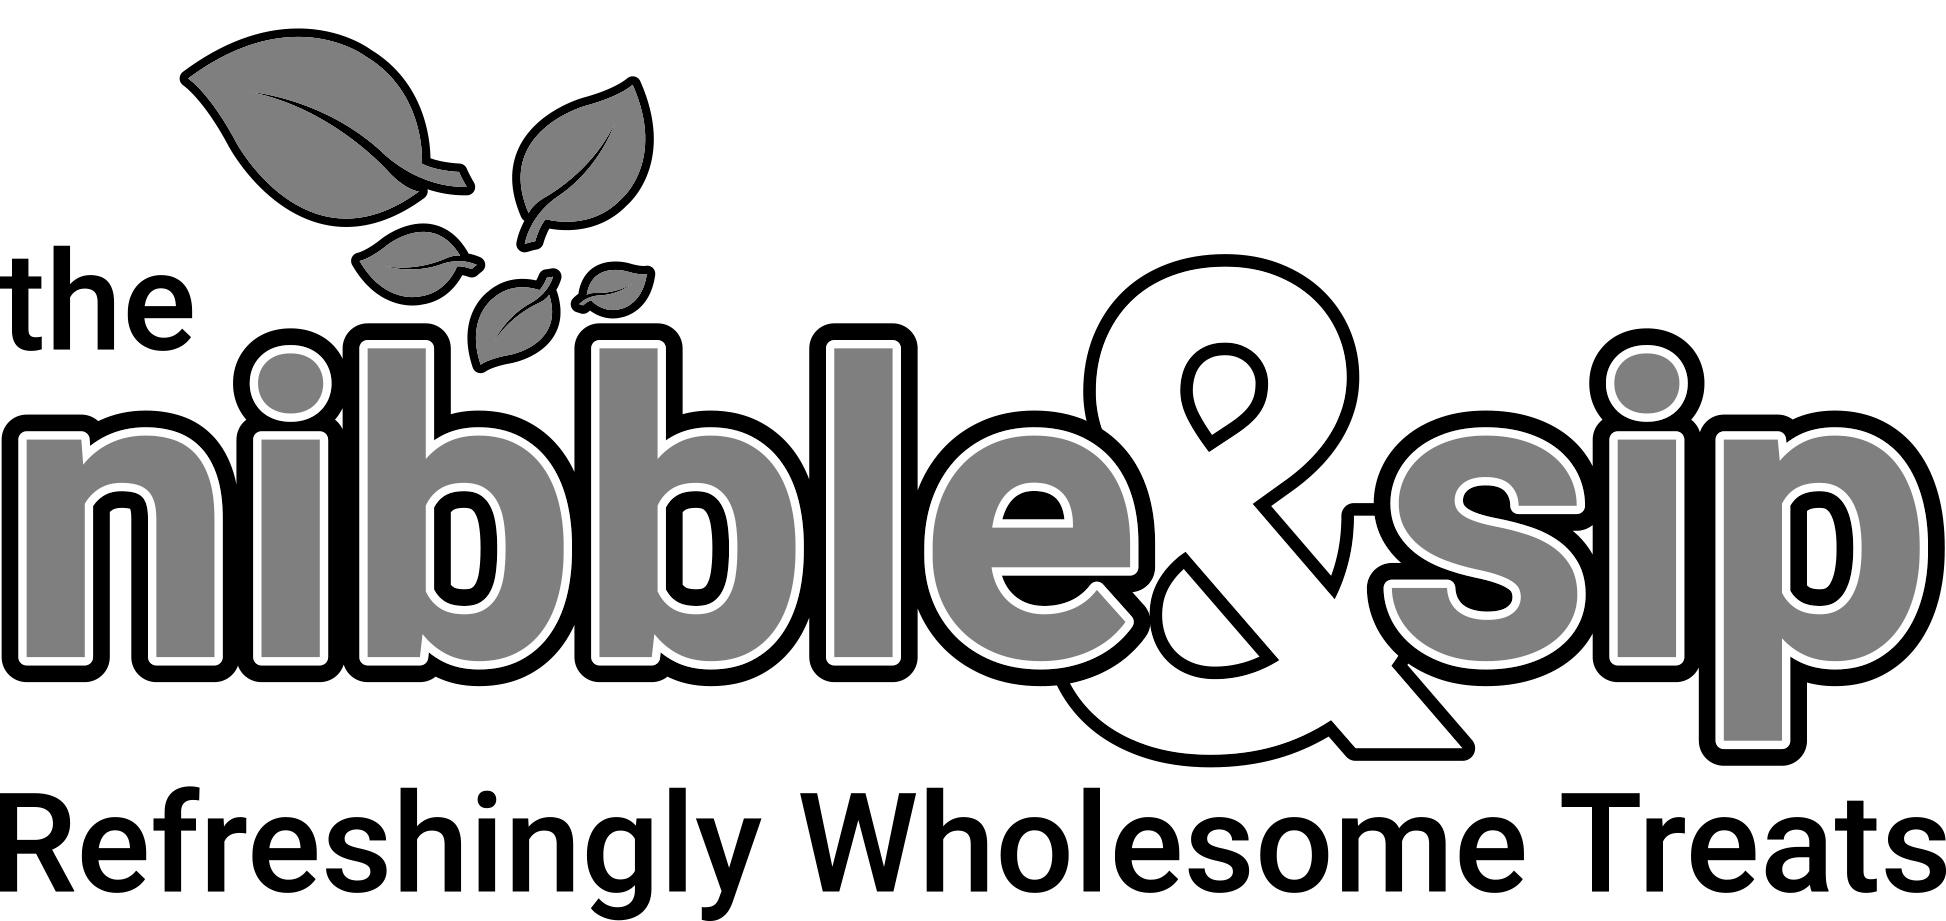 The-Nibble-&-Sip-LogoV2.jpg